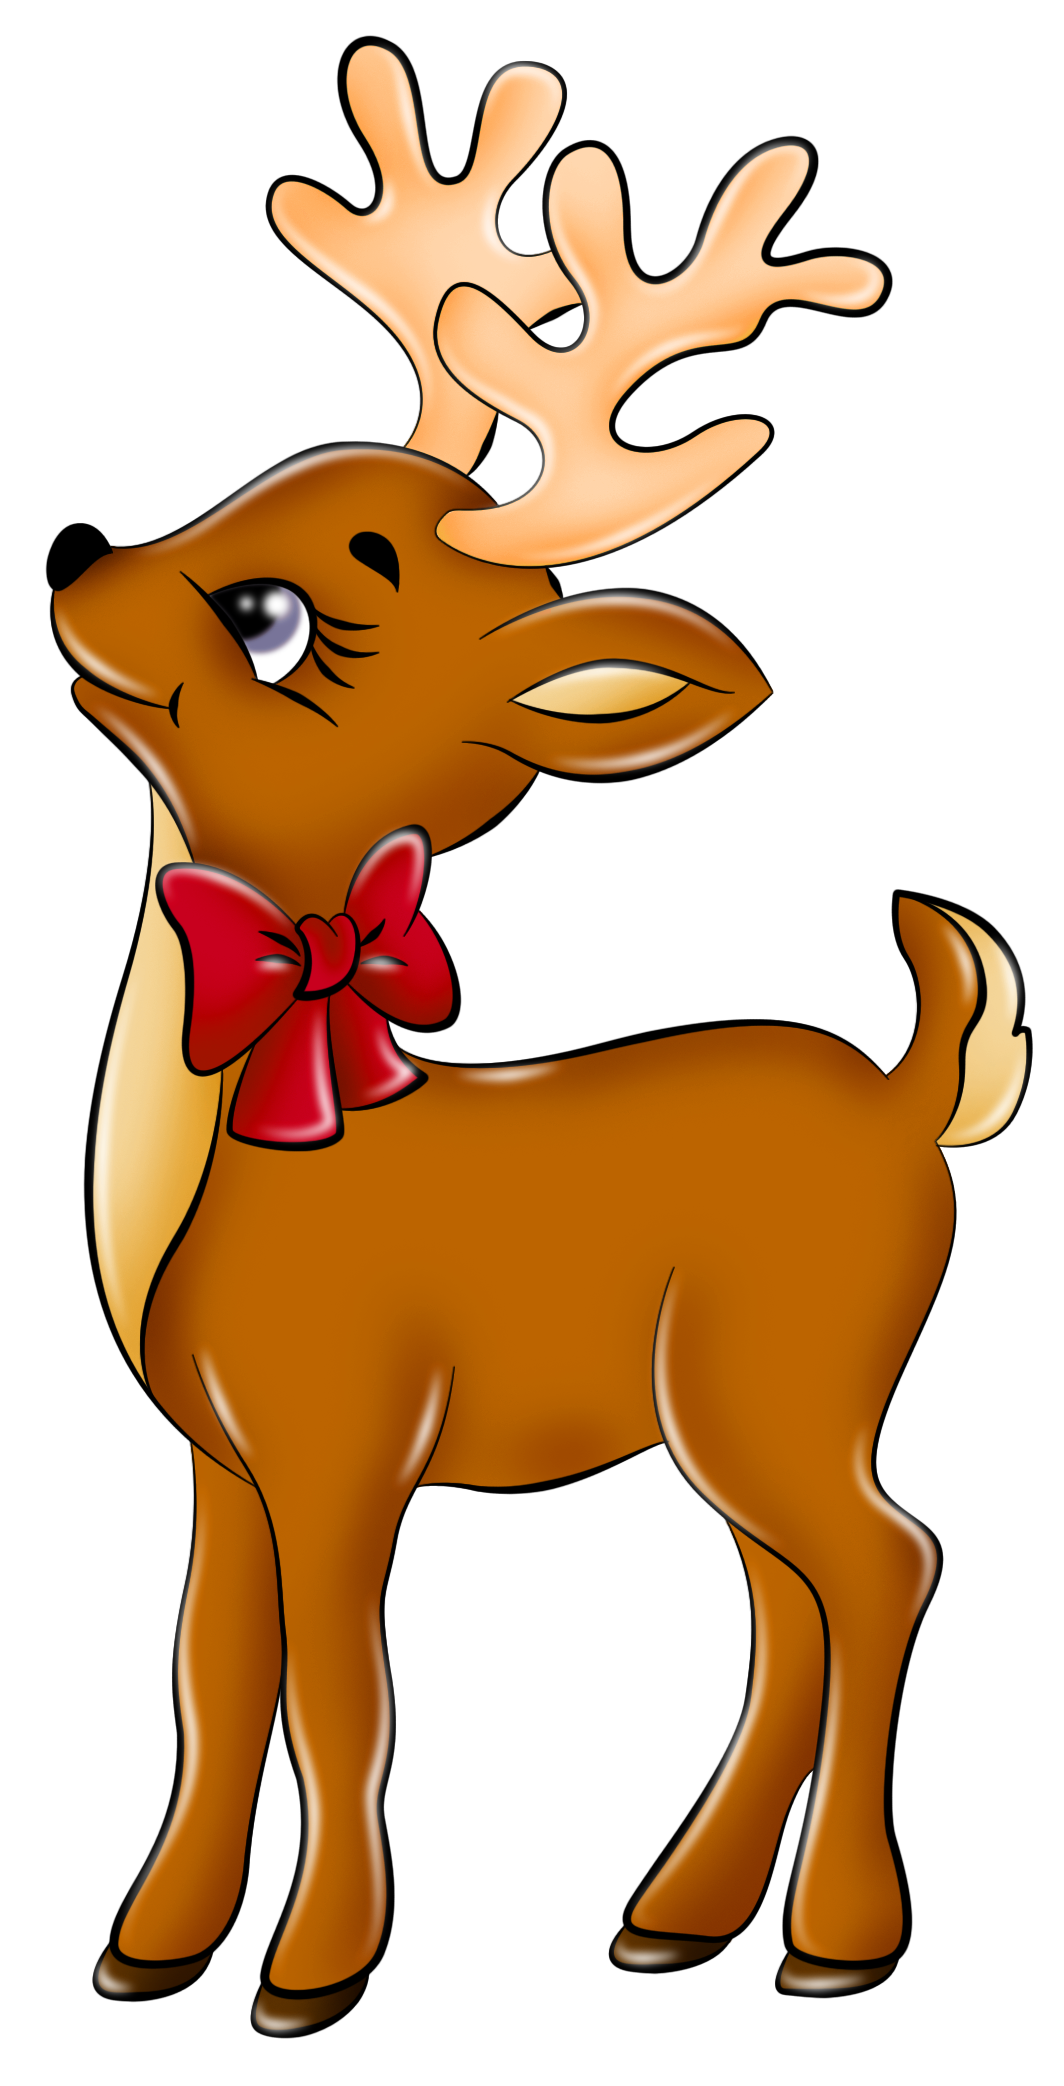 Cute Reindeer Clip Art Clipart   Free Clipart - Reindeer, Transparent background PNG HD thumbnail